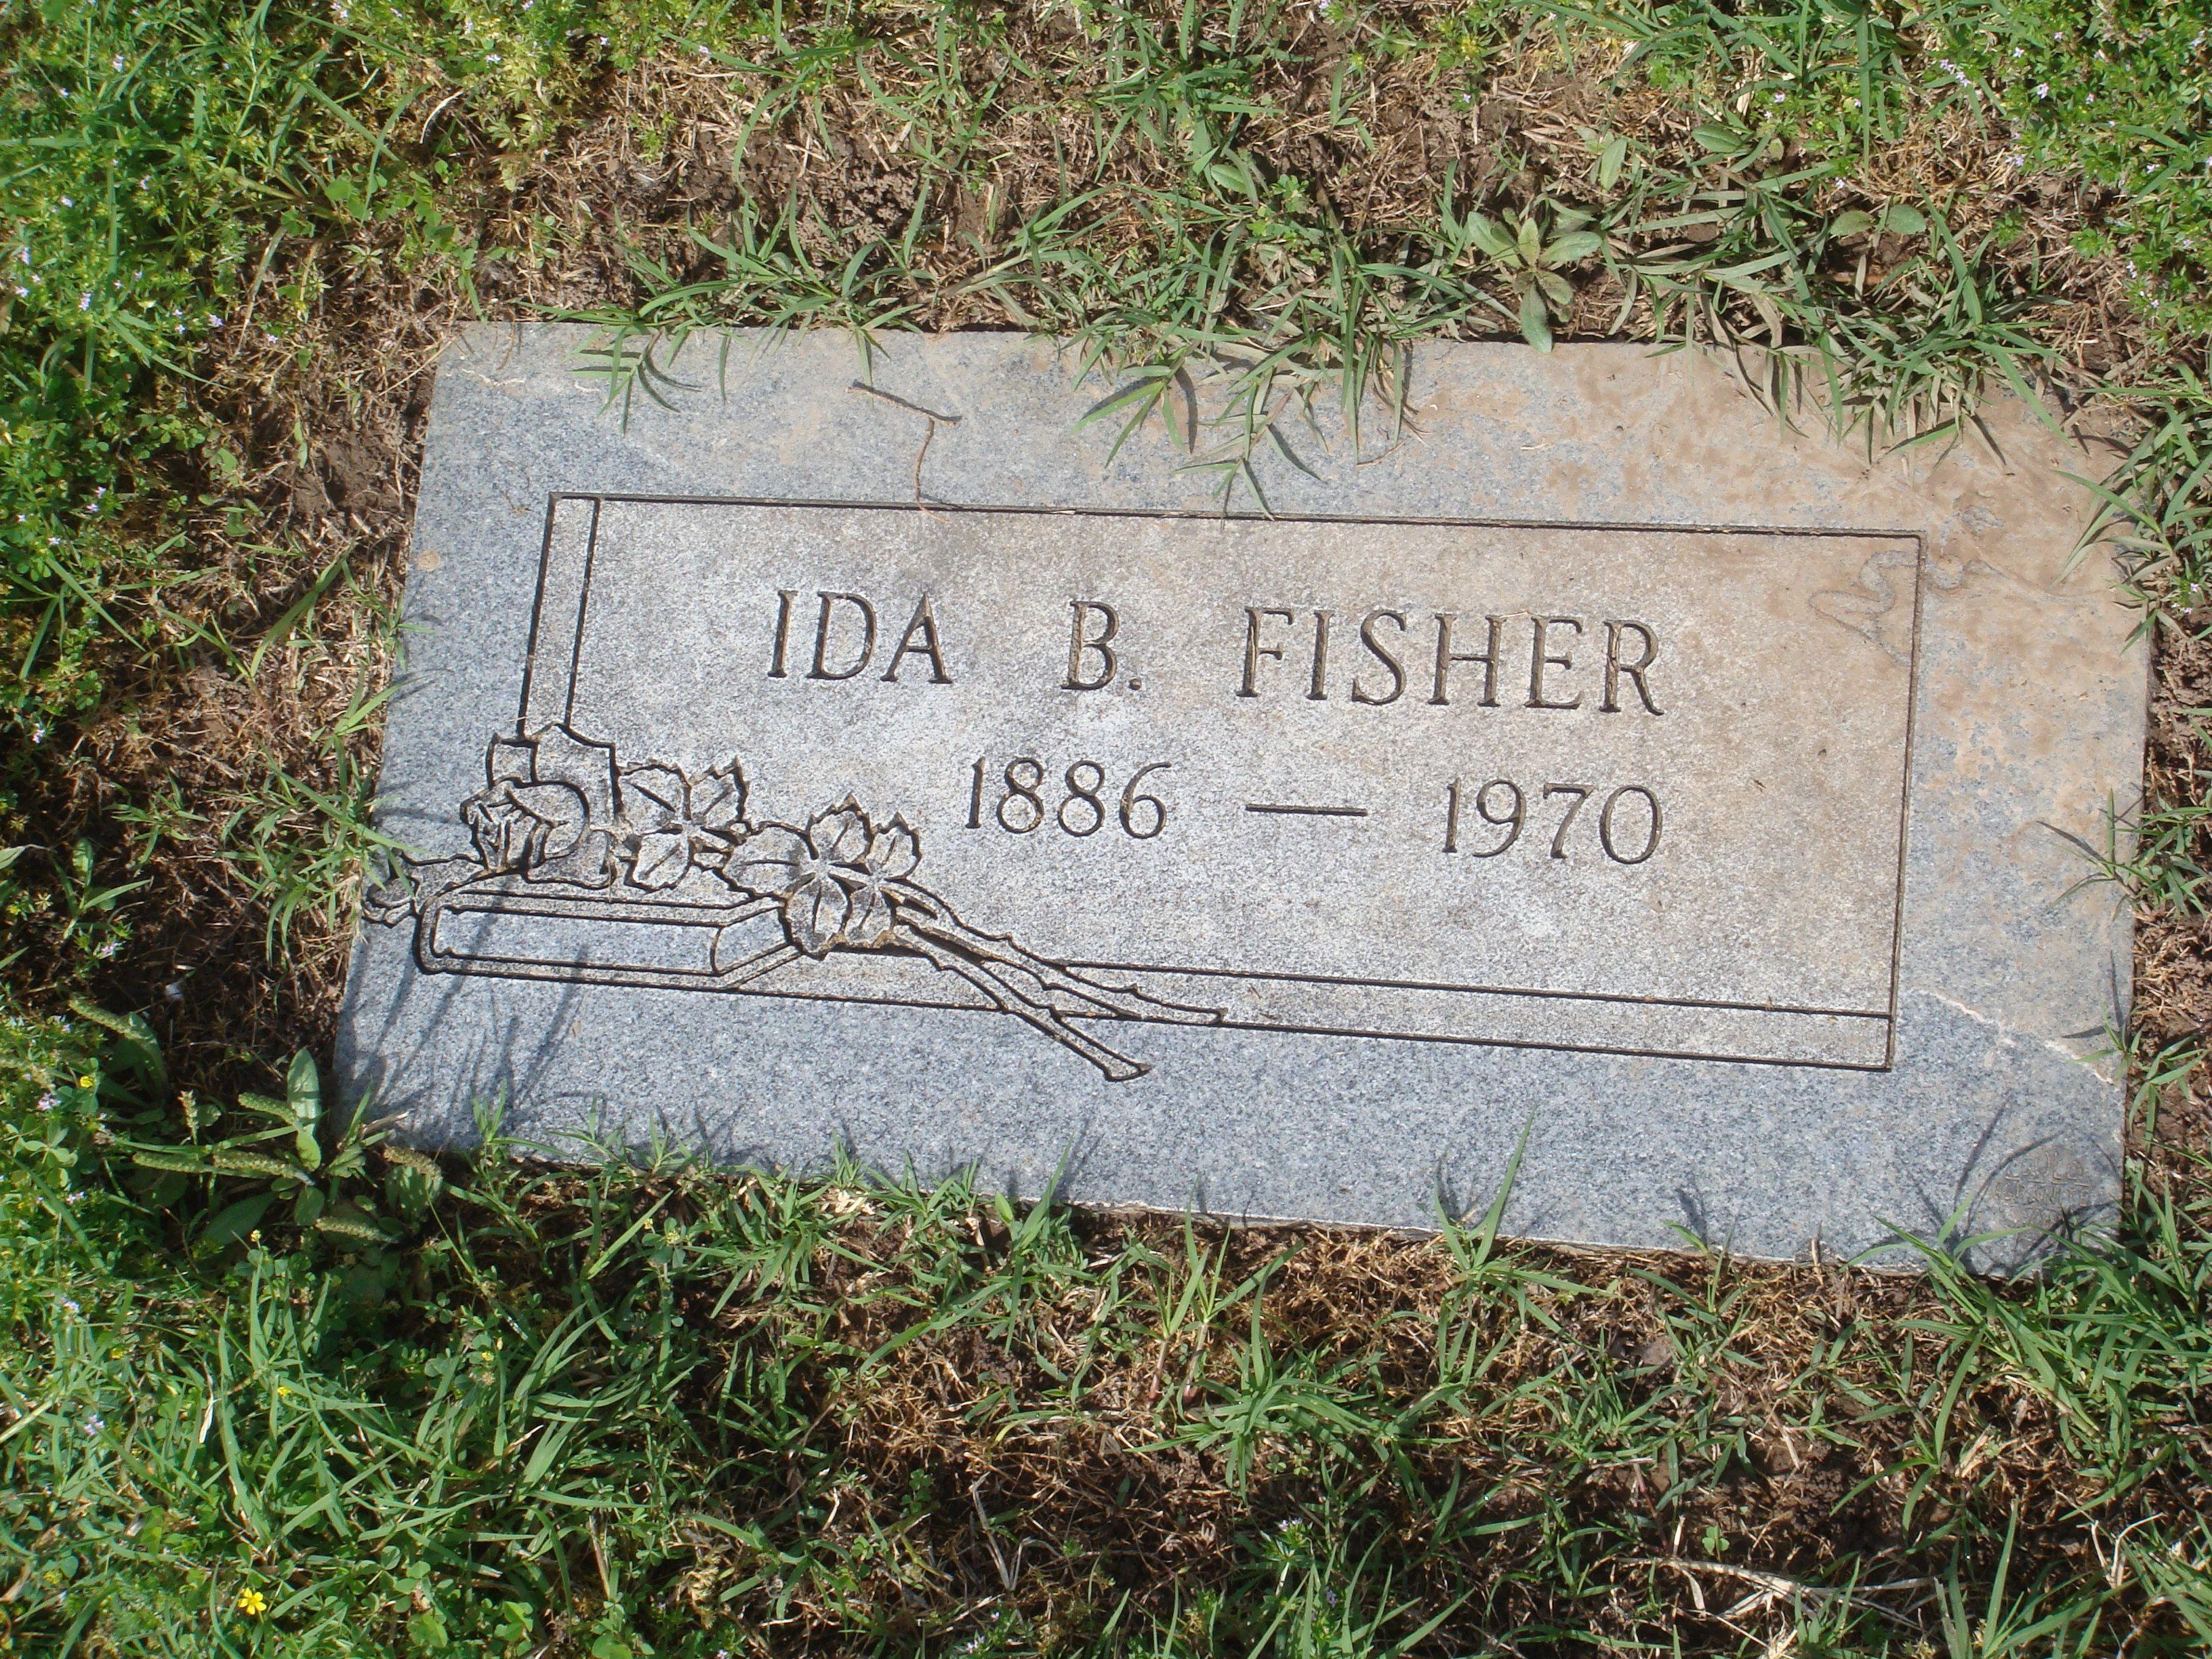 Ida B Fisher